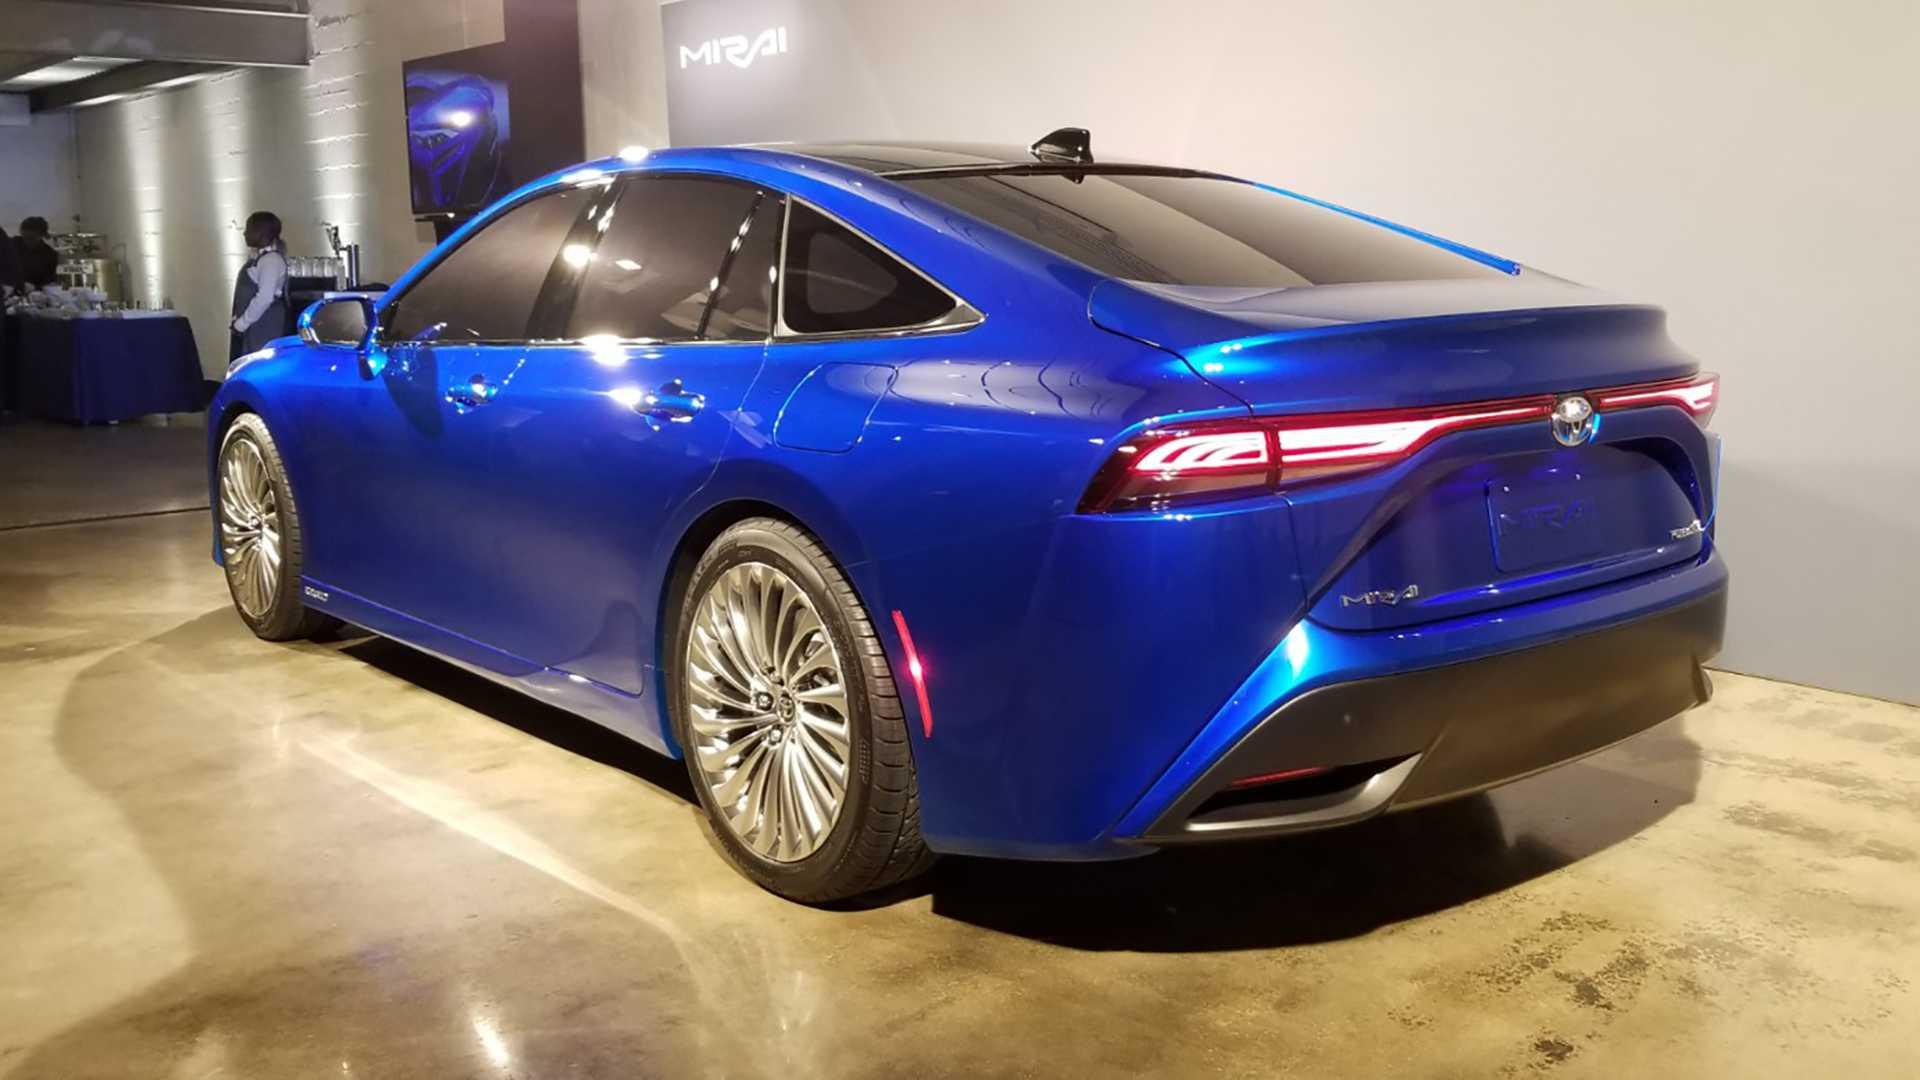 Second Gen Toyota Mirai Unveiled As Stunning Premium Sedan